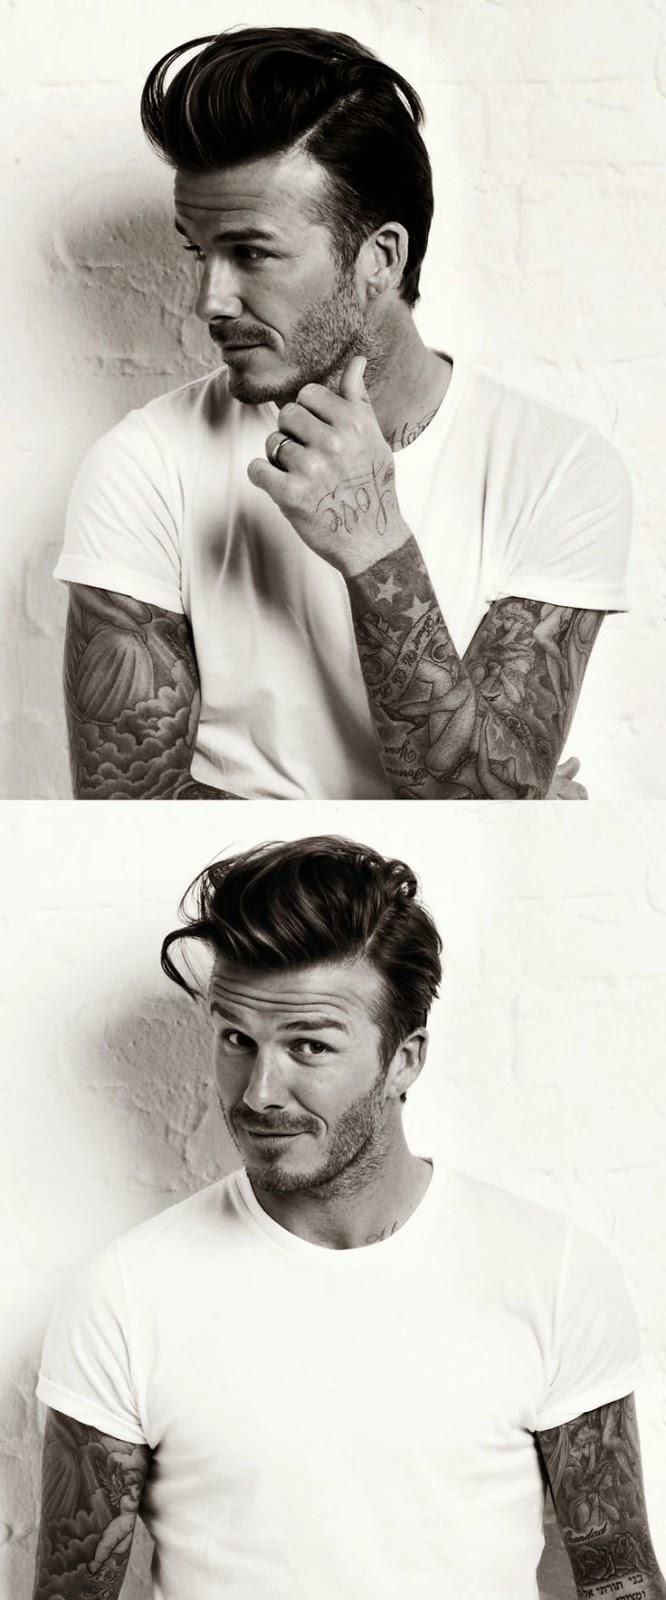 ♥  ♫ ♥ David Beckham  ♥  ♫ ♥ ♥  ♫ ♥ ♥•▬▬▬▬▬▬▬ ღೋƸ̵̡Ӝ̵̨̄Ʒღೋ▬▬▬▬▬▬▬♥• ♥  ♫ ♥